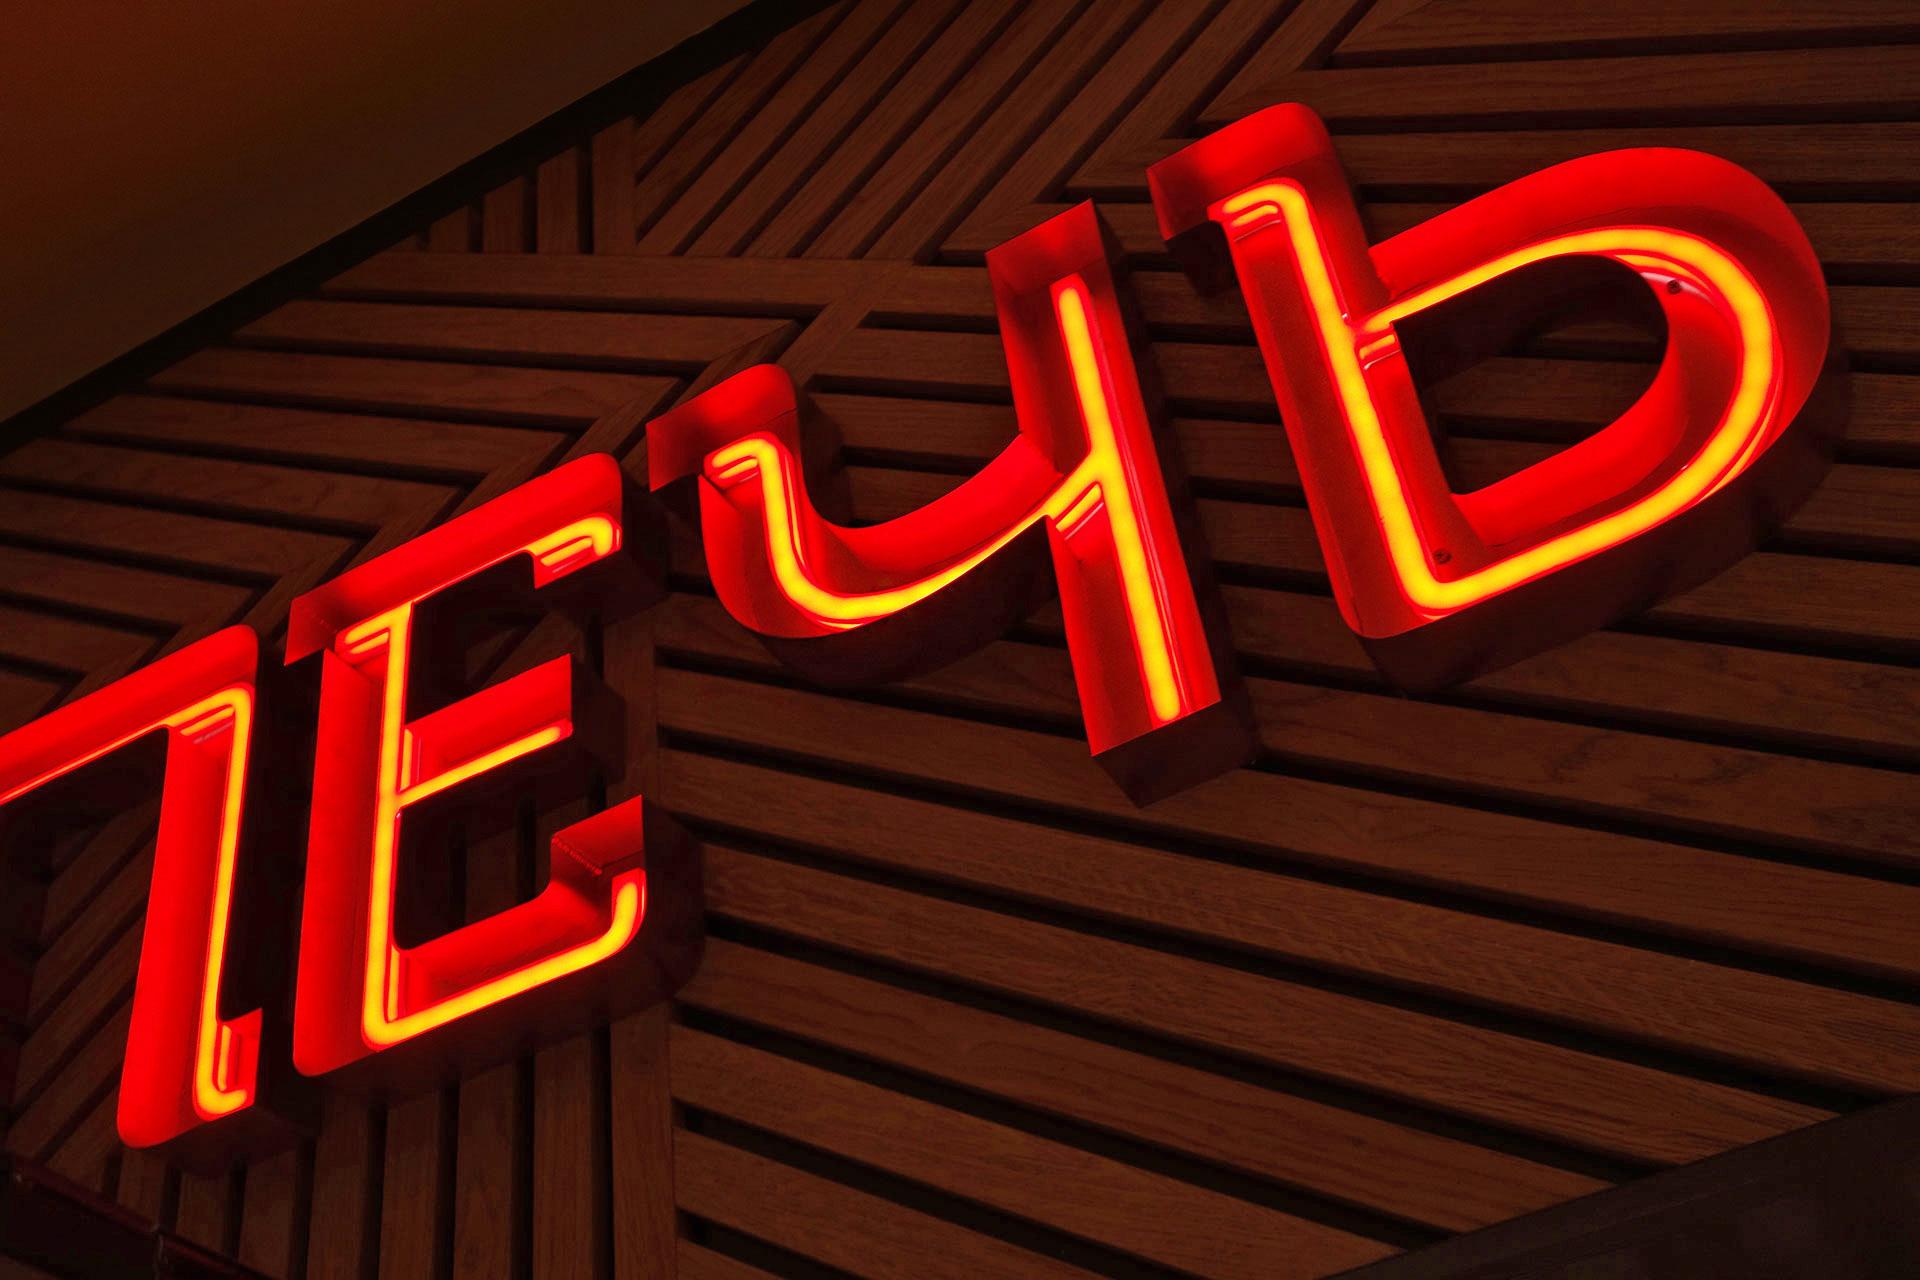 ASGARD, Market place, Restaurant identity, Design, Navigation